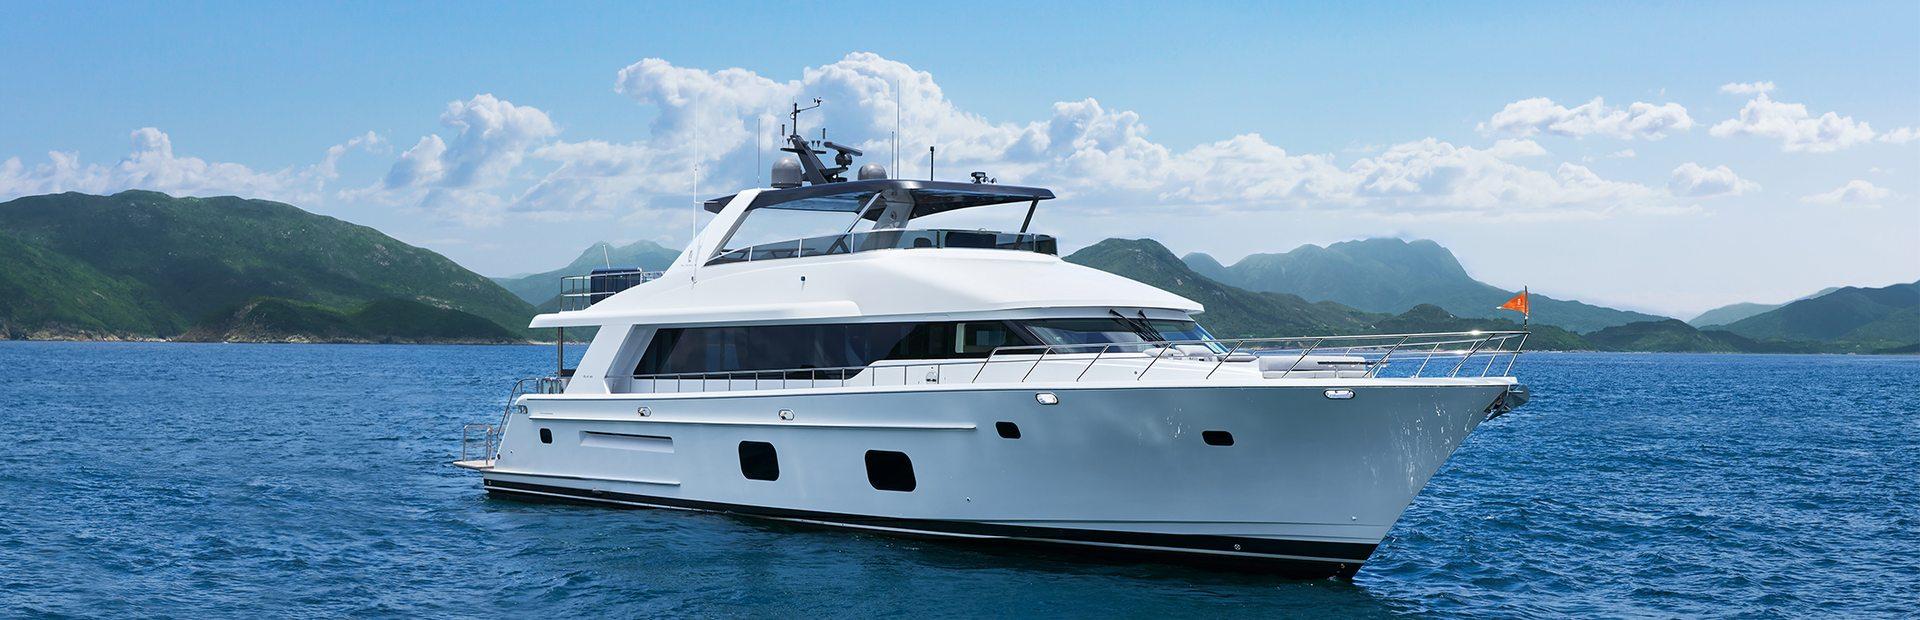 CLB88 Yacht Charter